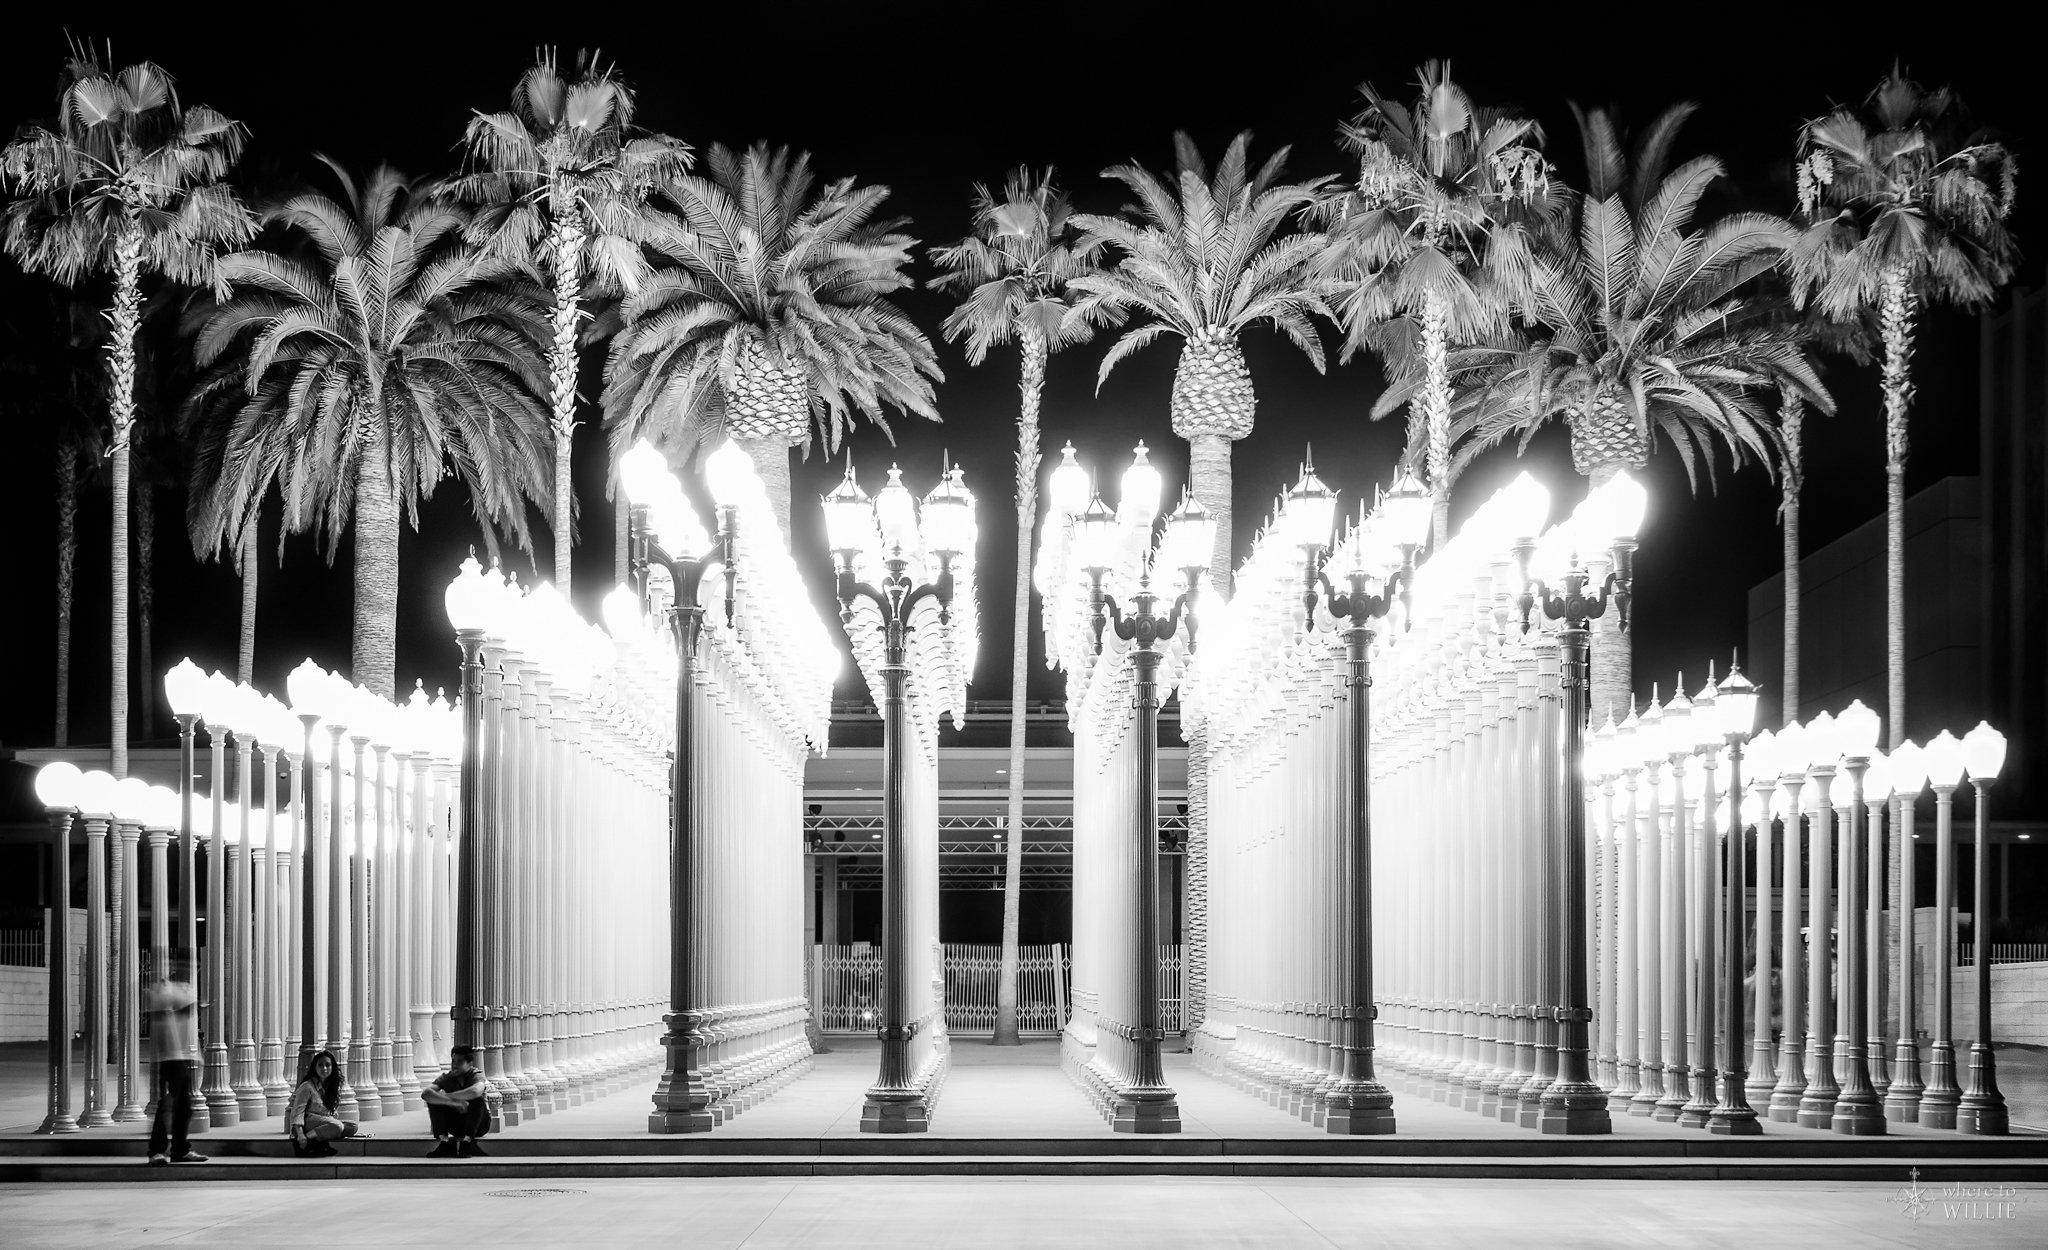 Night Lights Los Angeles William Woodward & Night Lights - u0027Urban Lightu0027 // Los Angeles California* | Where ... azcodes.com